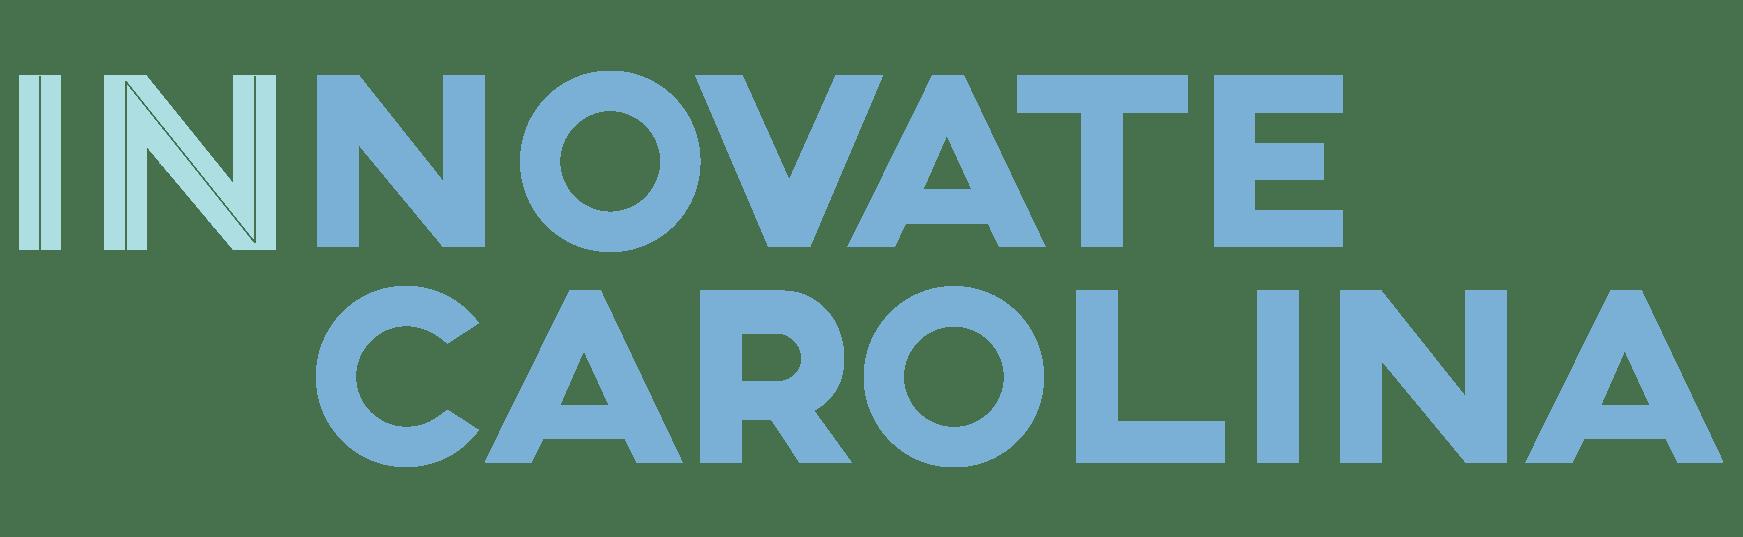 Innovate-Carolina-logo.png